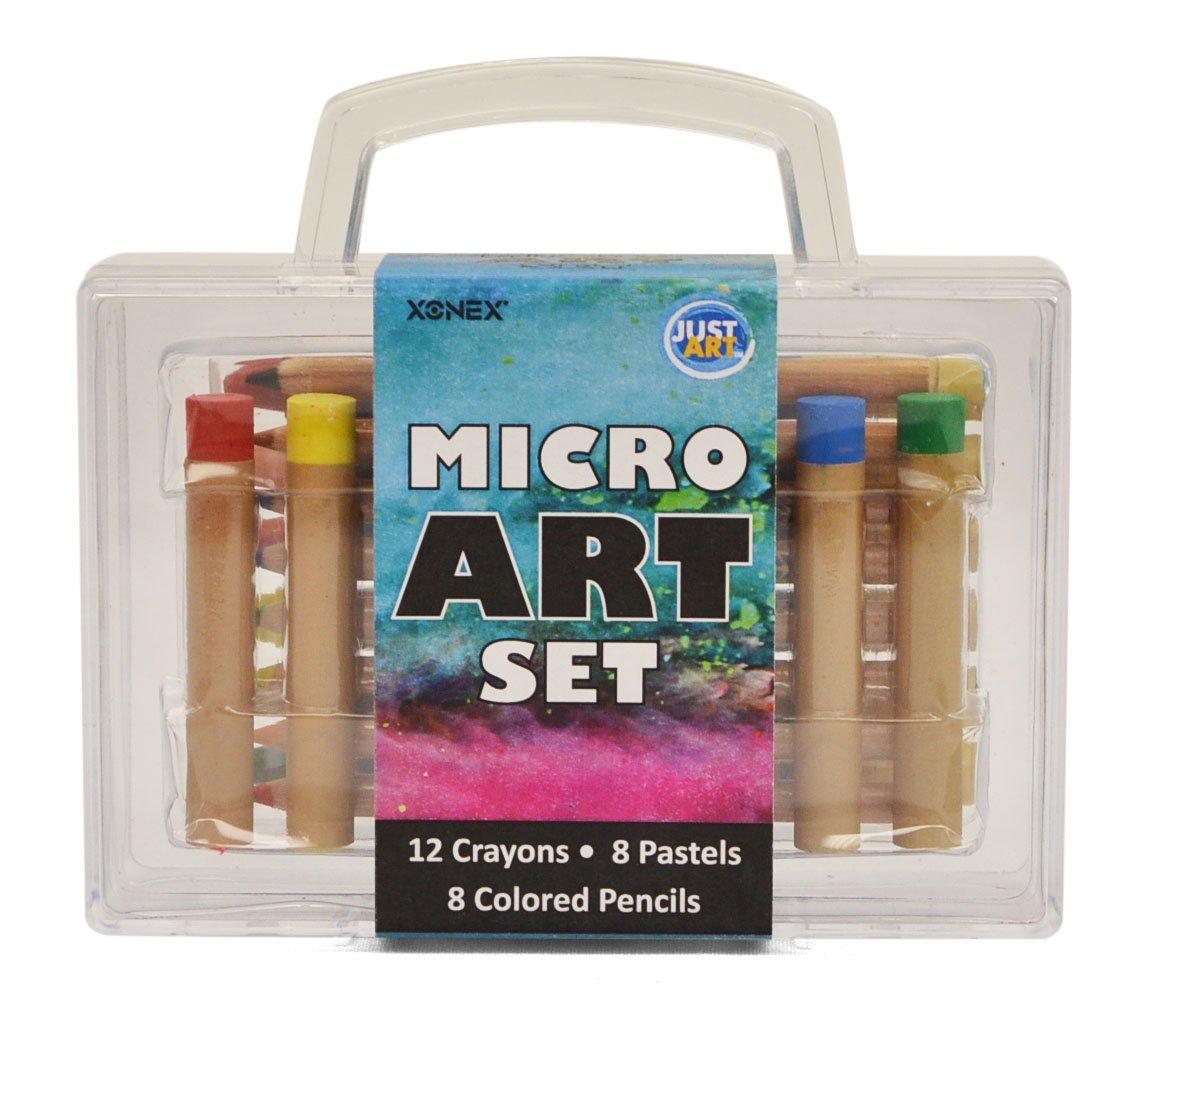 Xonex Micro Art Set, Stores 12 Micro Crayones, 8 Micro Colored Pencils, 8 Micro Oil Pastels, 5 X 5-1/2 X 1-1/2 Inches, 1 Count (59034)